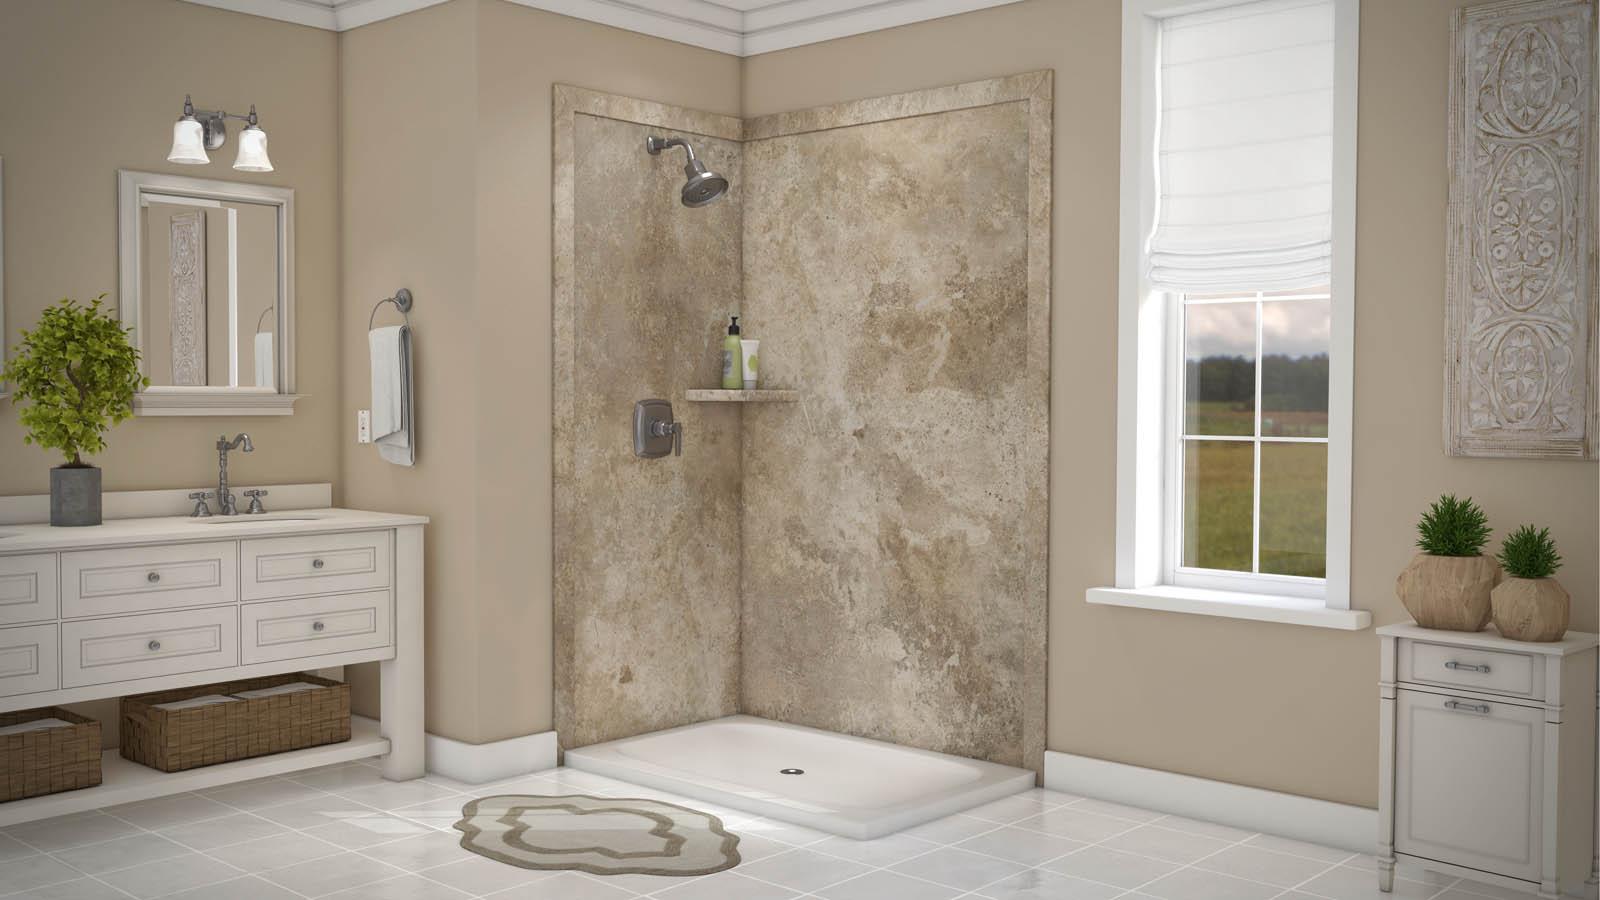 Oakville Bathroom Remodeling - Five Star Bath Solutions of ...